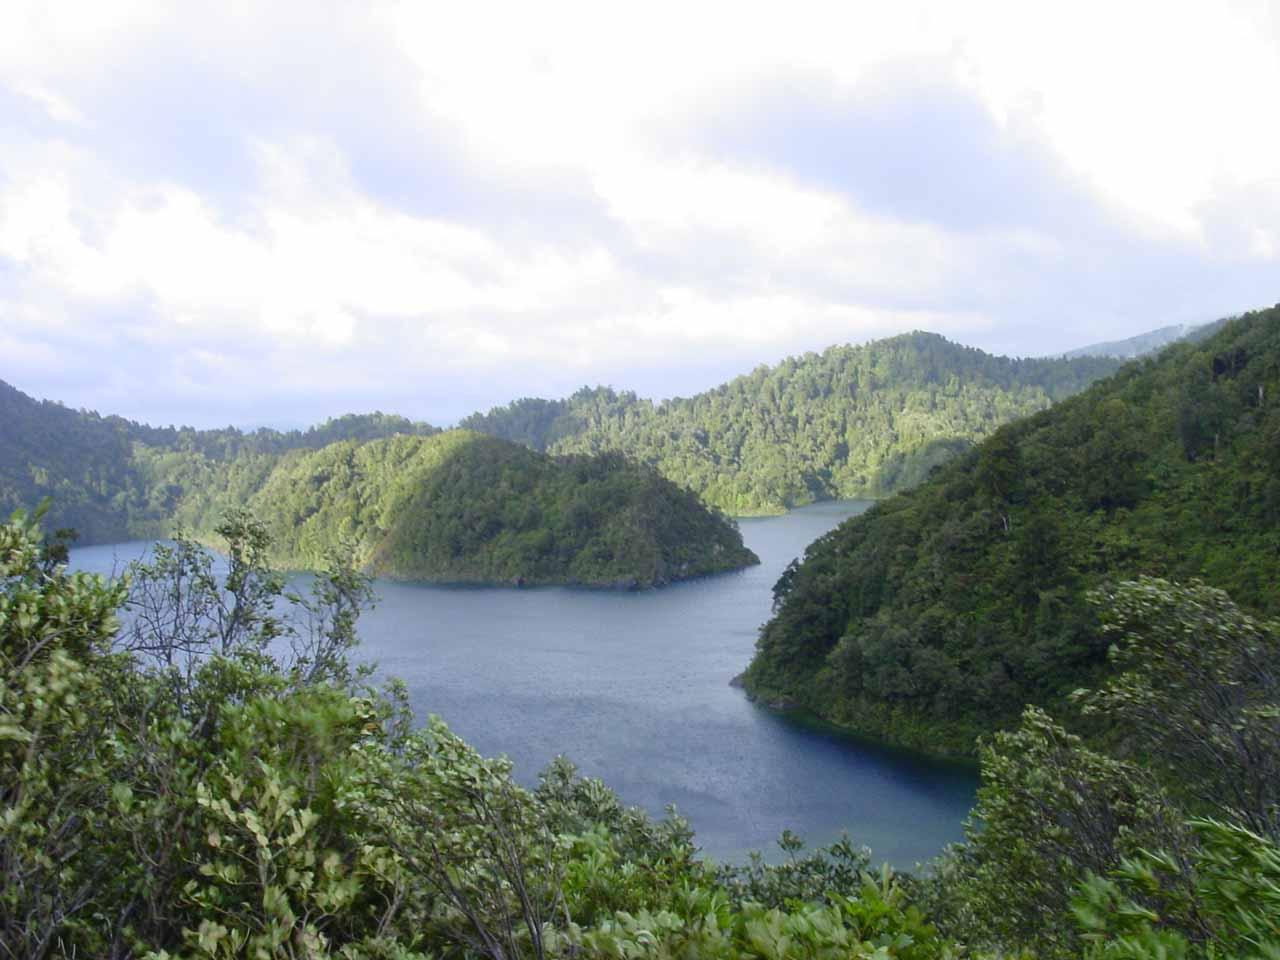 Before Mokau Falls, the bush scenery dominating Te Urewera National Park started to change a bit as the remote Lake Waikaremoana started revealing itself to us